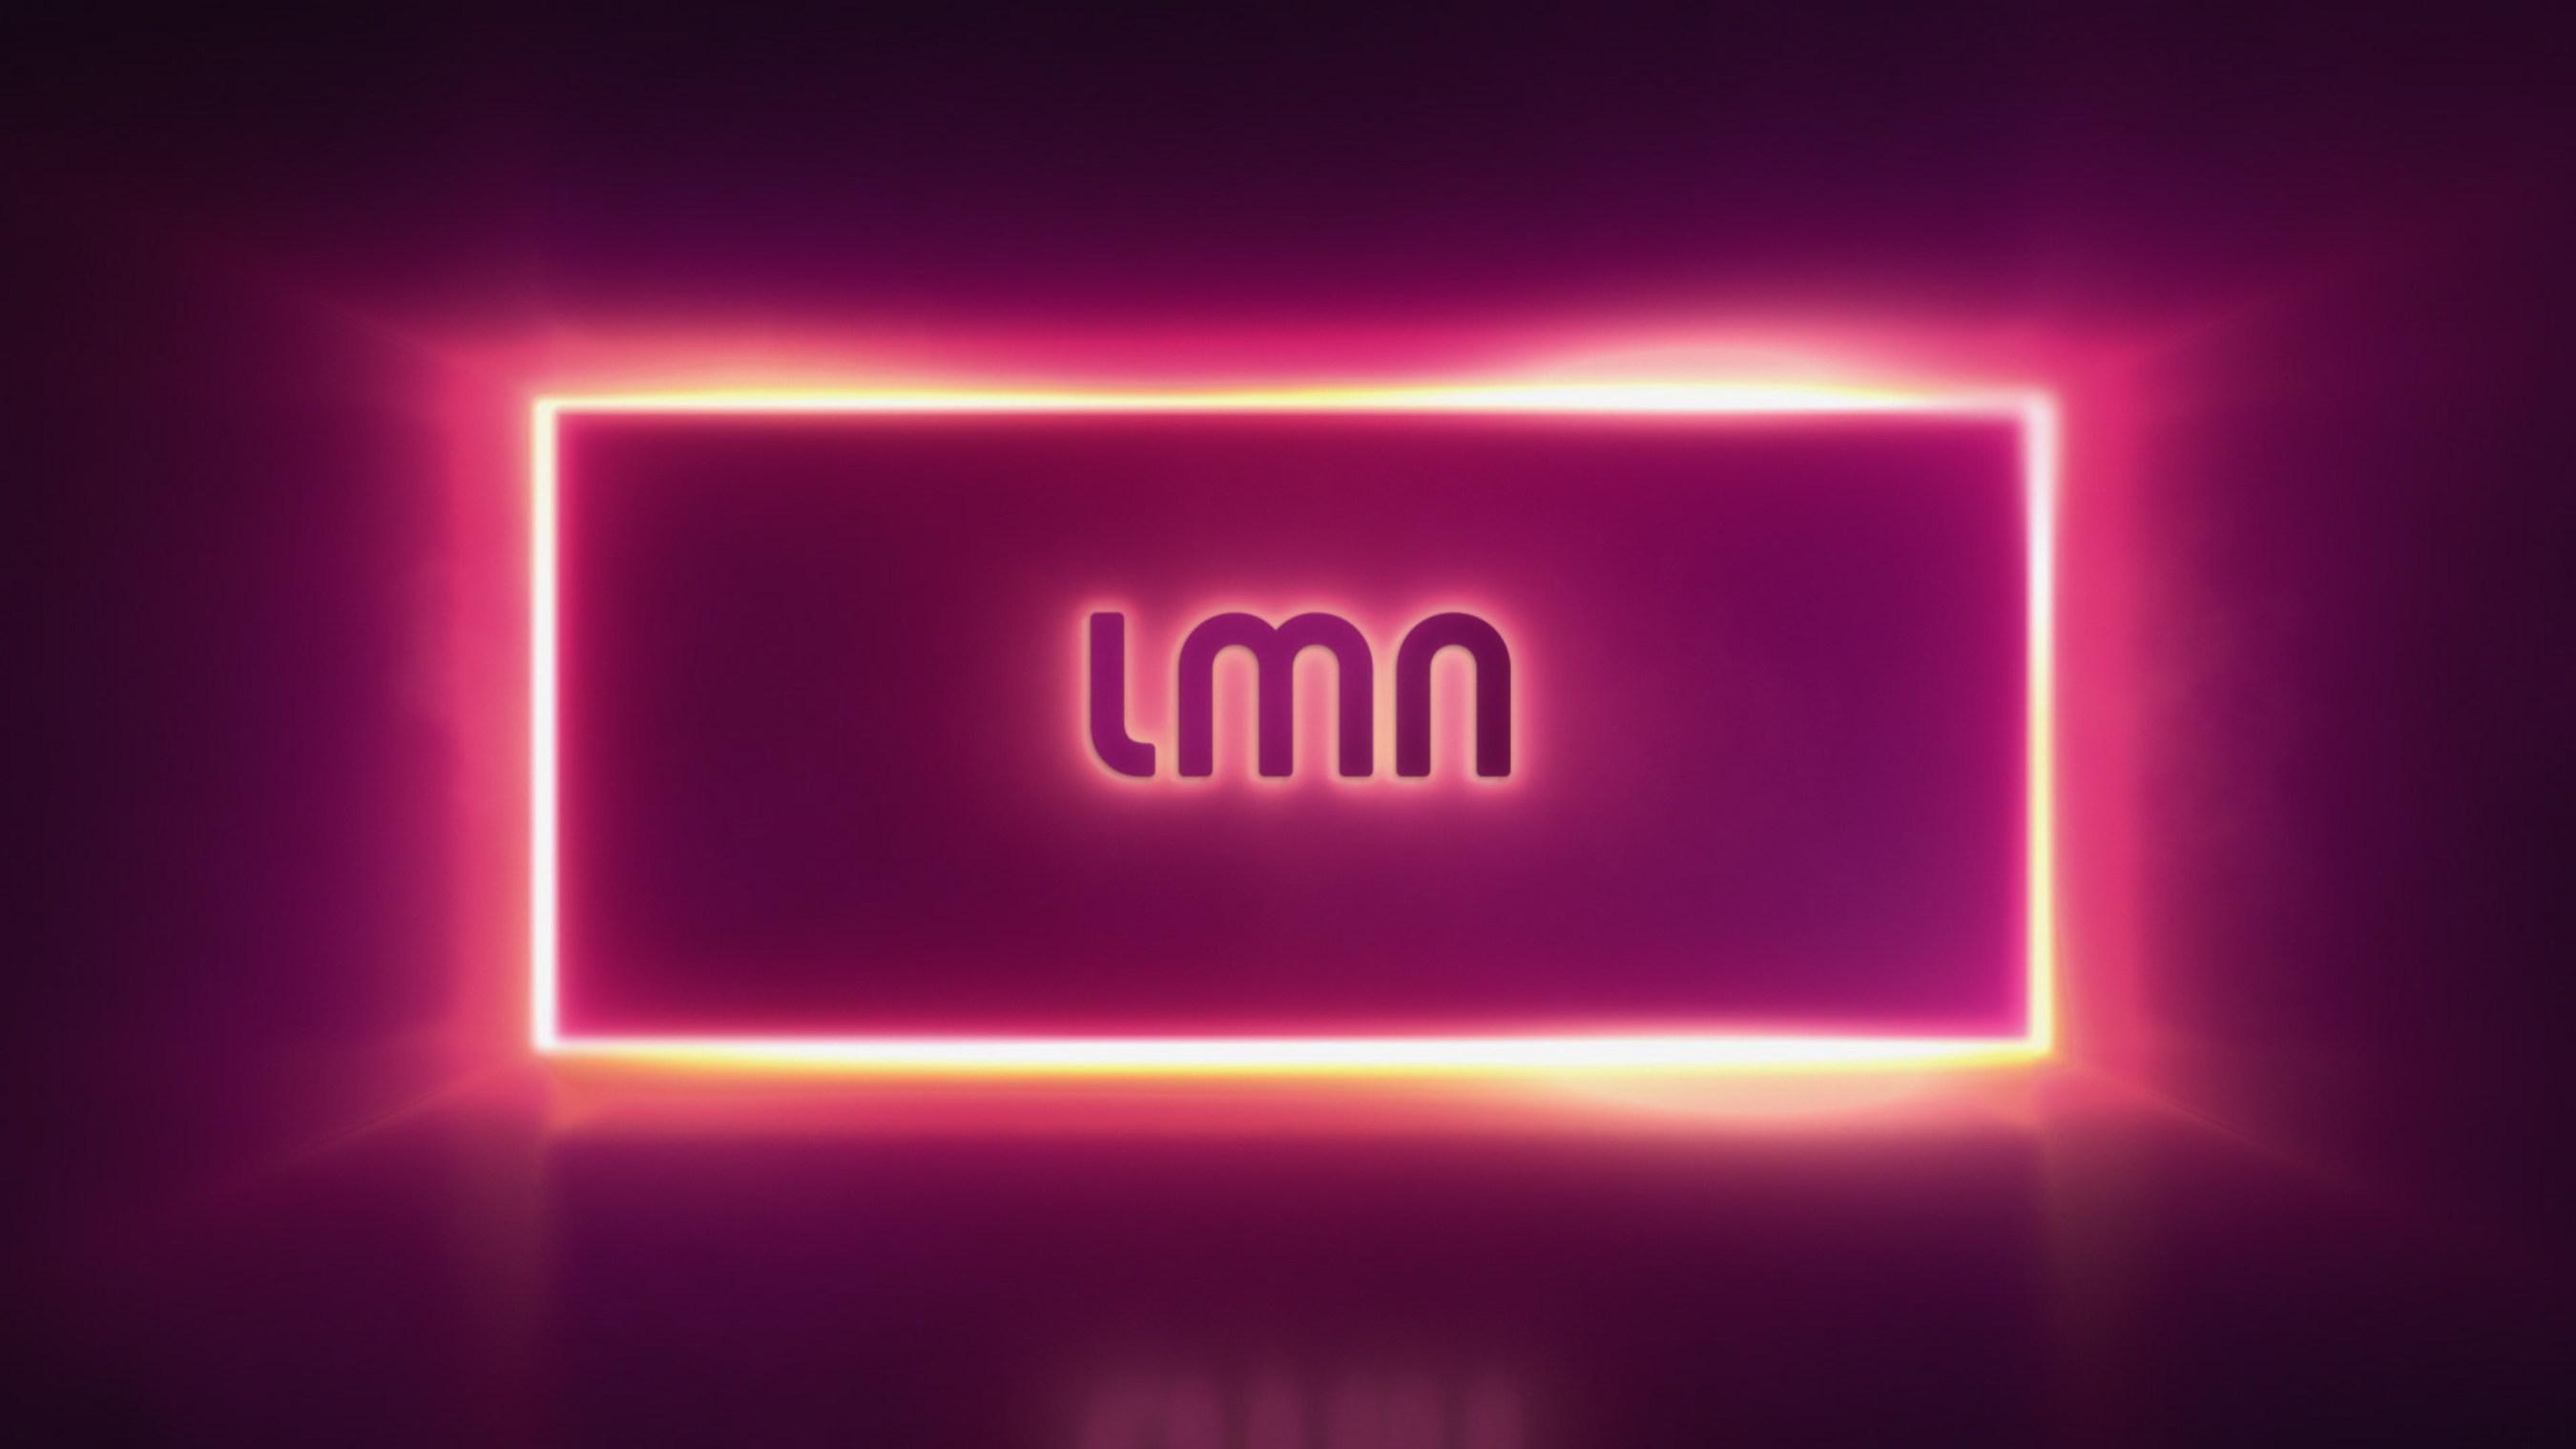 Adolescent Creates the LMN Full Channel Rebrand